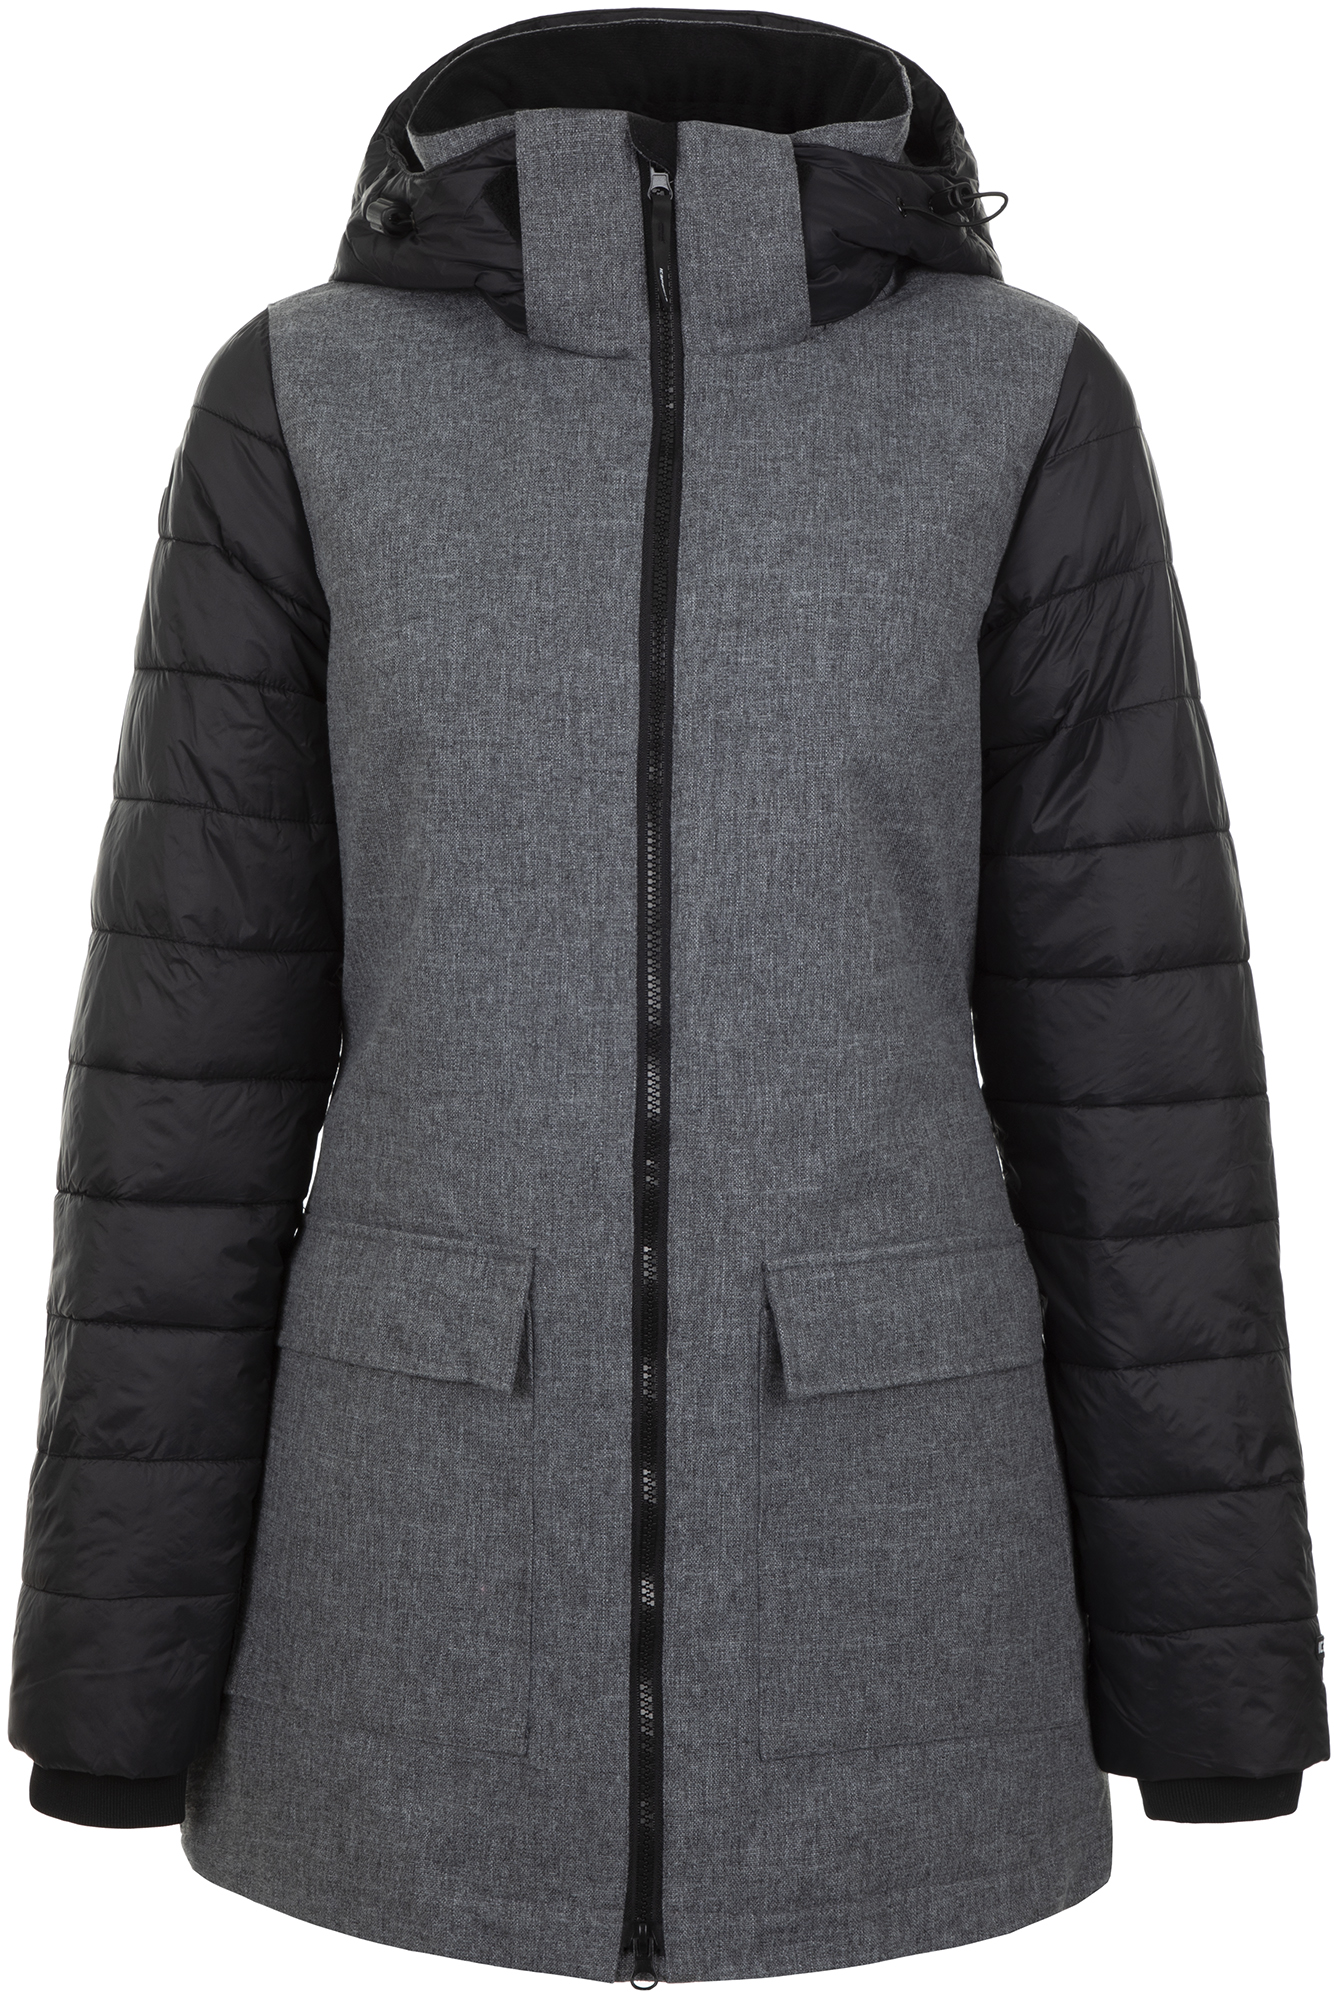 цена IcePeak Куртка утепленная женская IcePeak Loona, размер 48